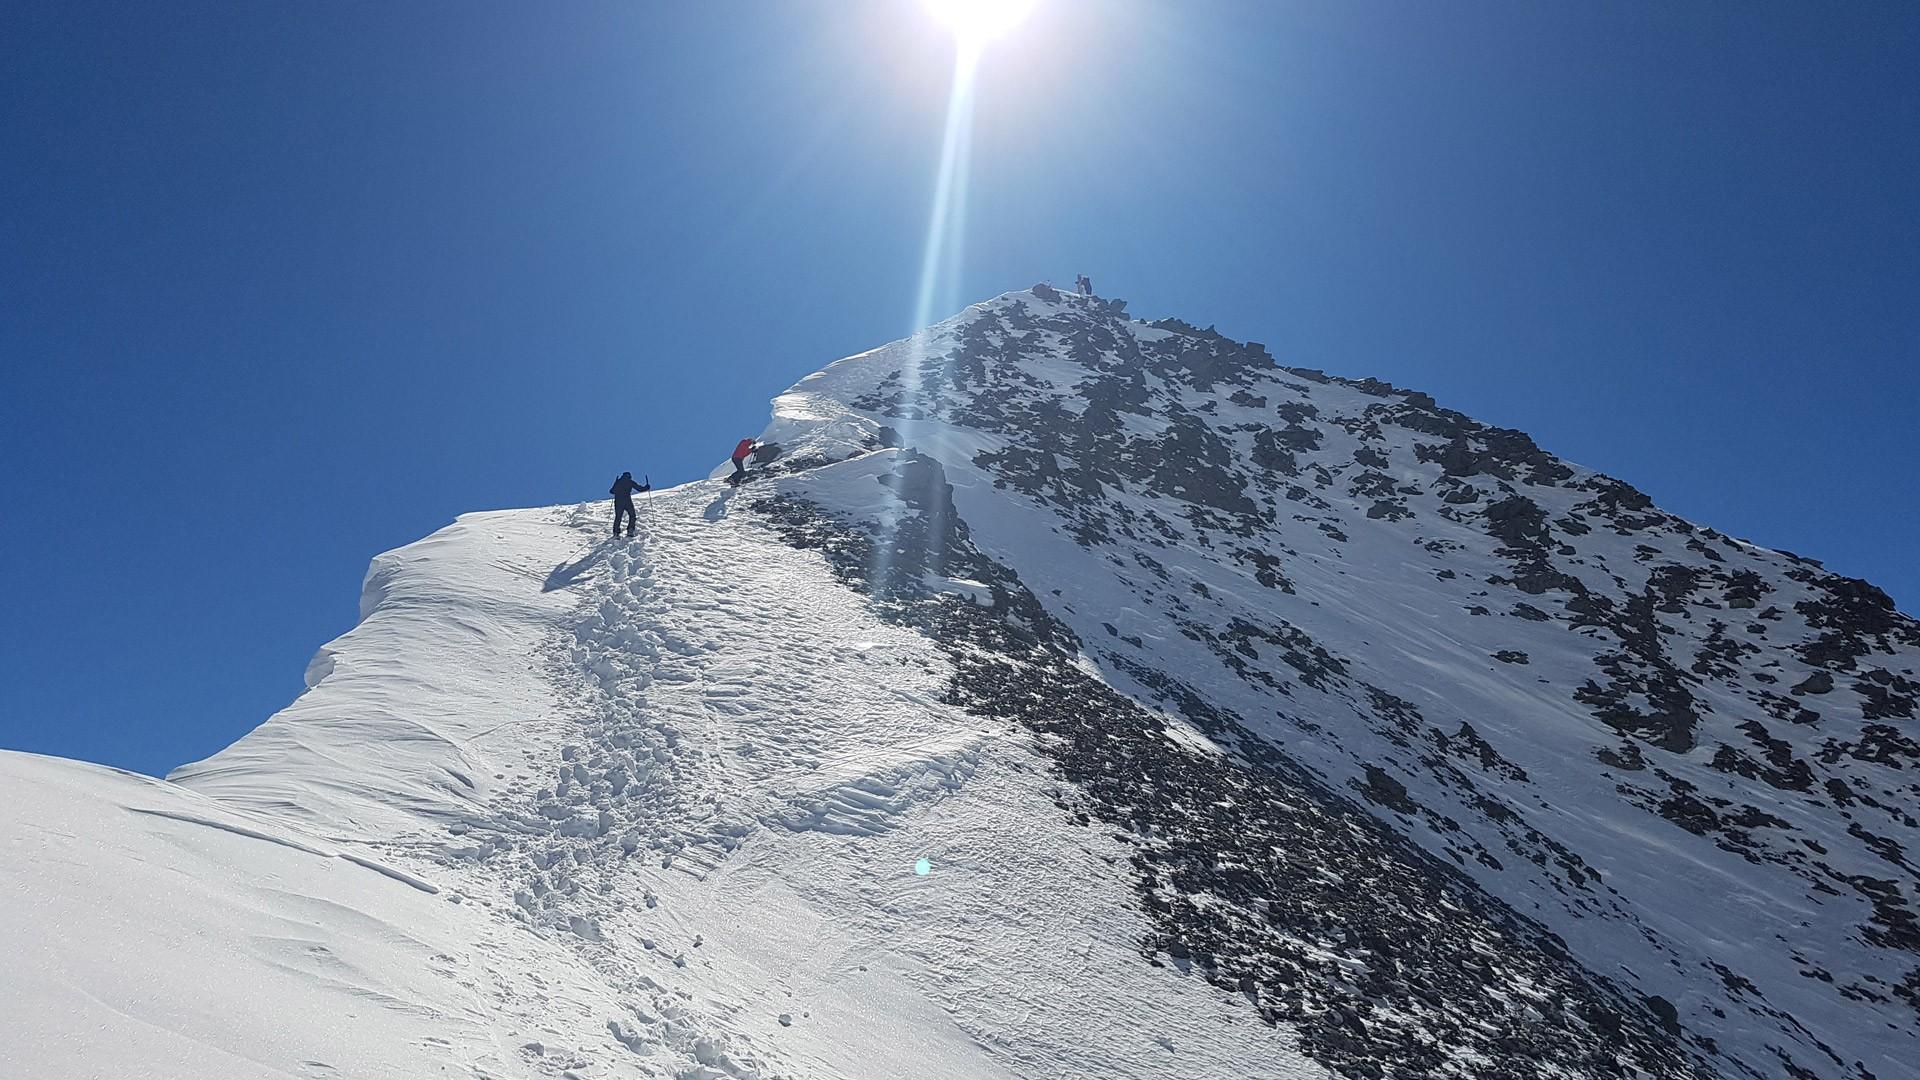 Klettergurt Skitouren : Klettergurt skitour test tests